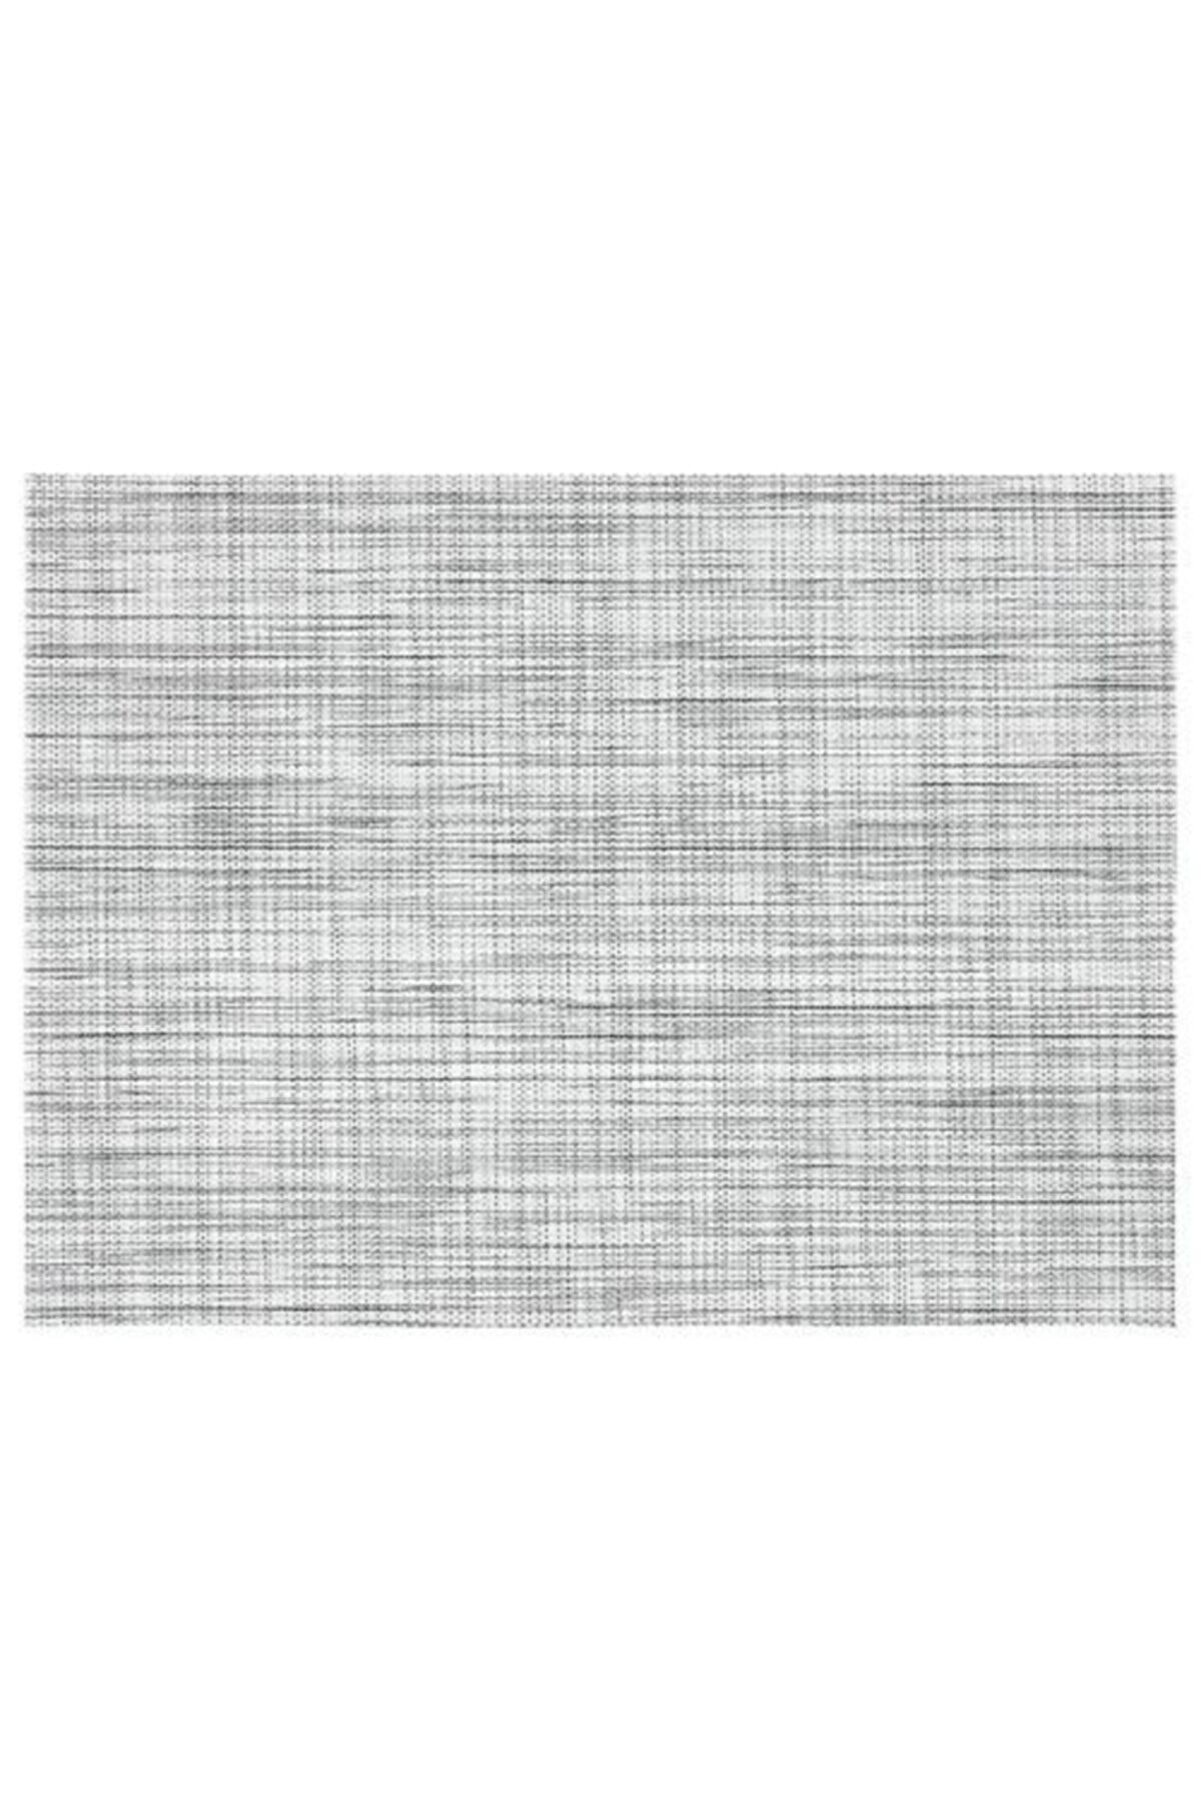 IKEA Amerikan Servis Siyah-beyaz Renk 45x33 Cm Meridyendukkan 1 Adet